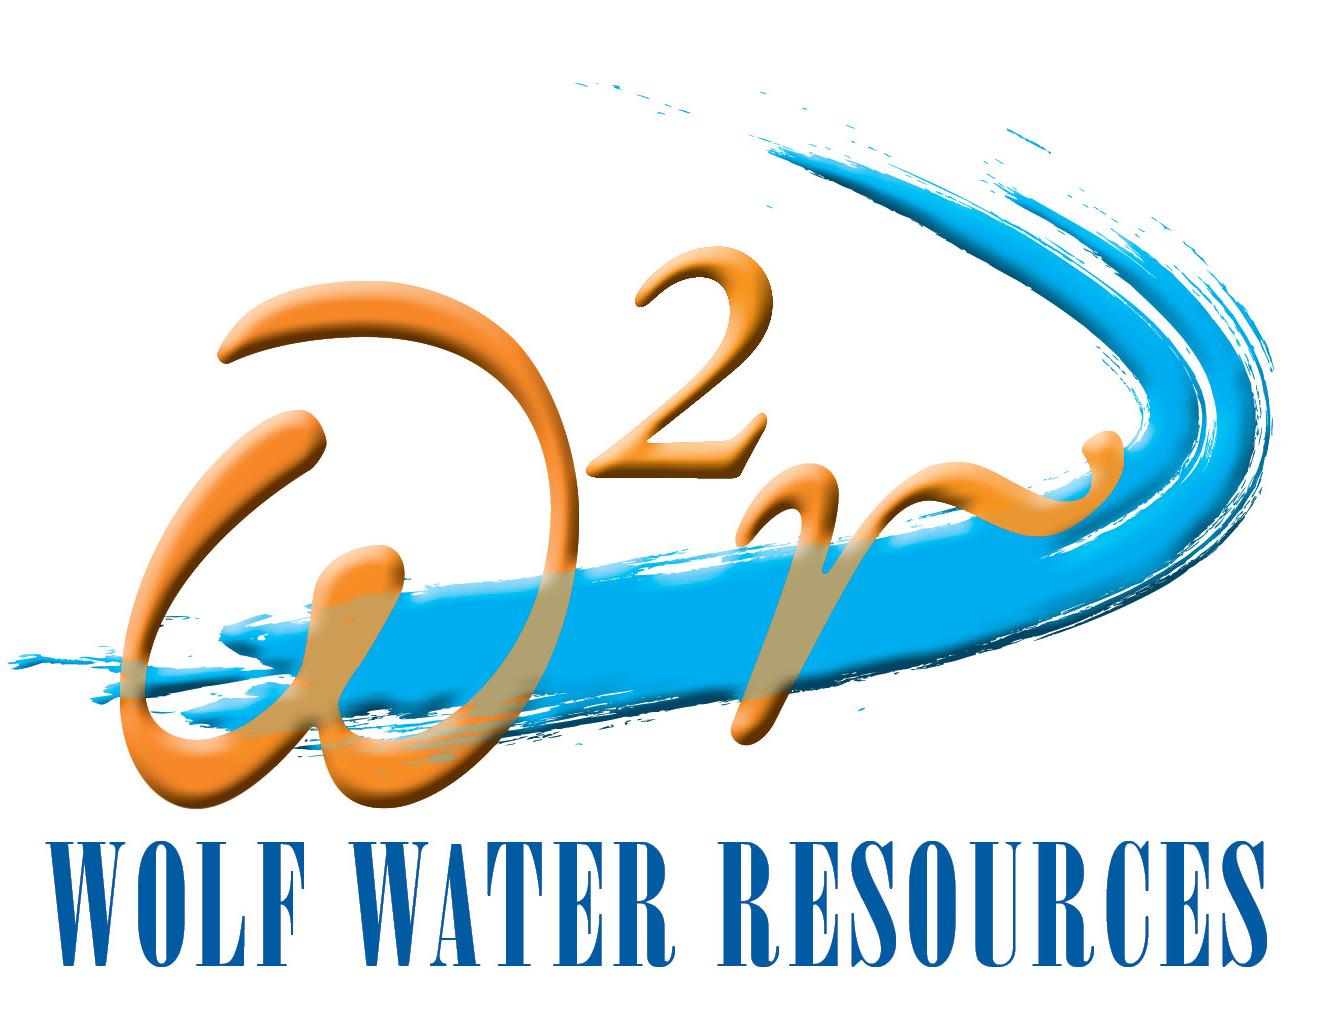 wolf water resources logo oregon's bounty fundraiser 2018